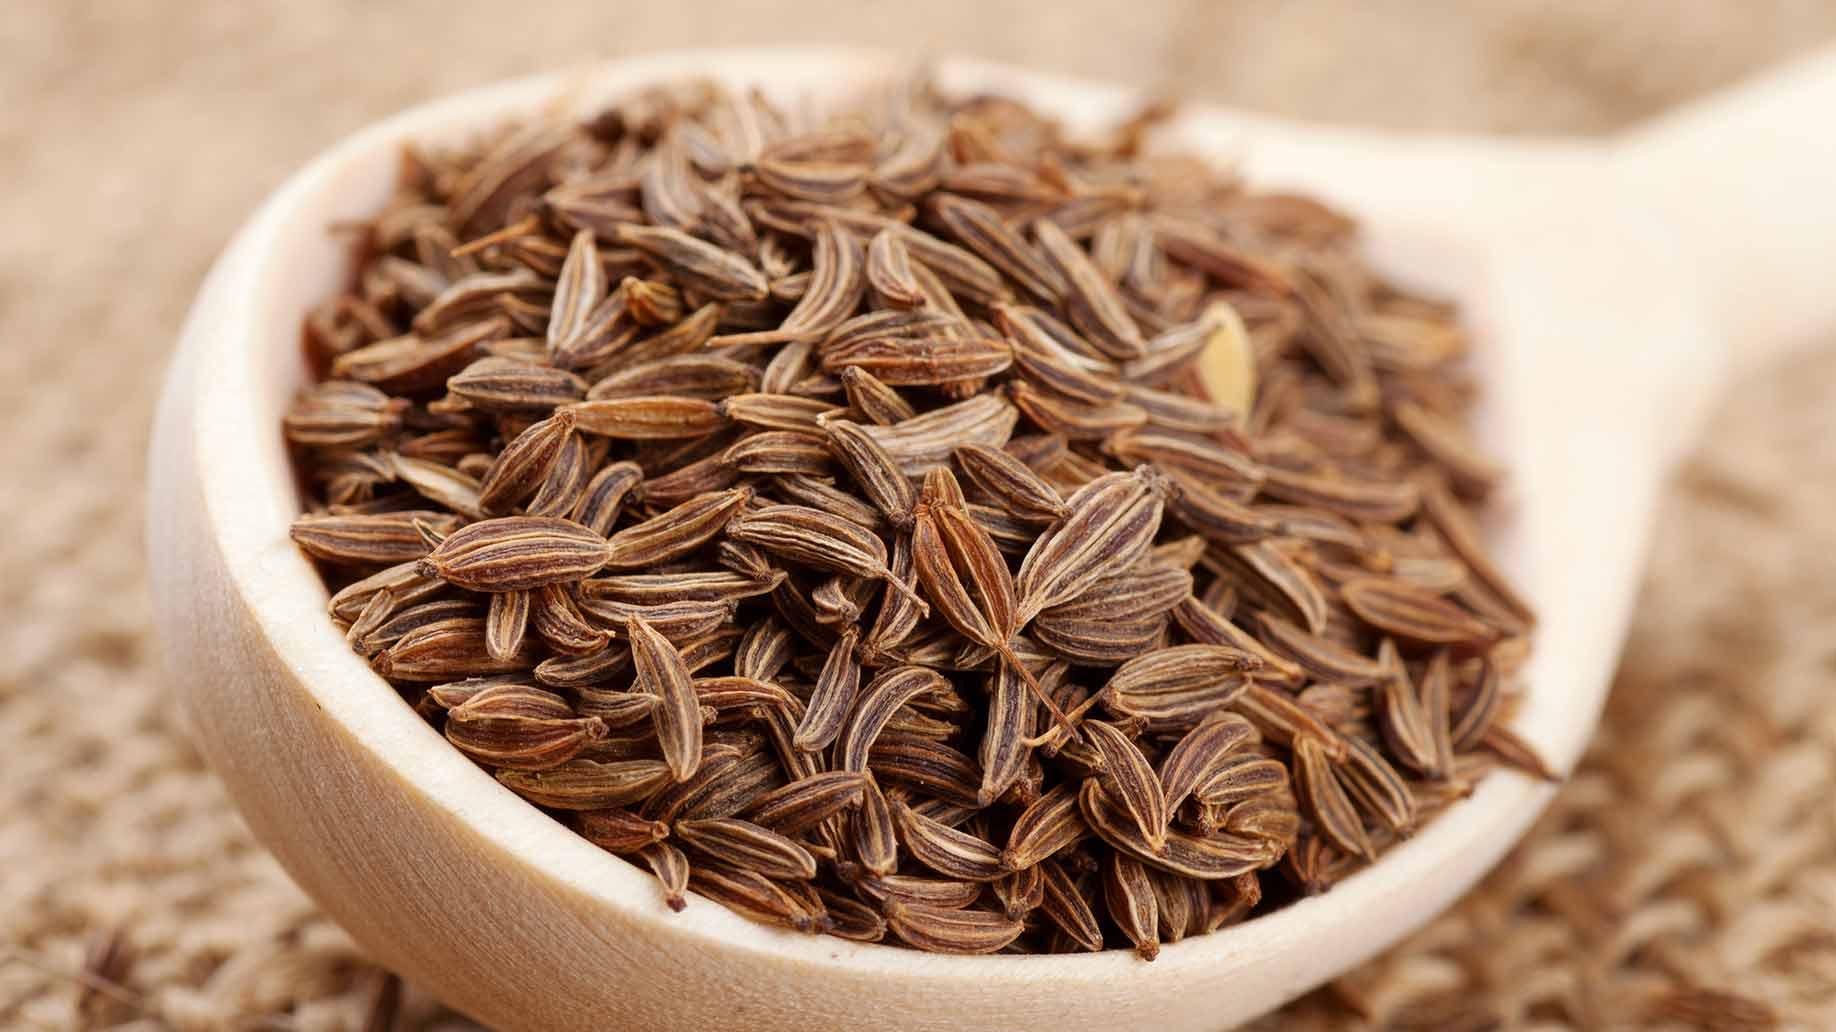 fennel seeds brown unmilled spoonful